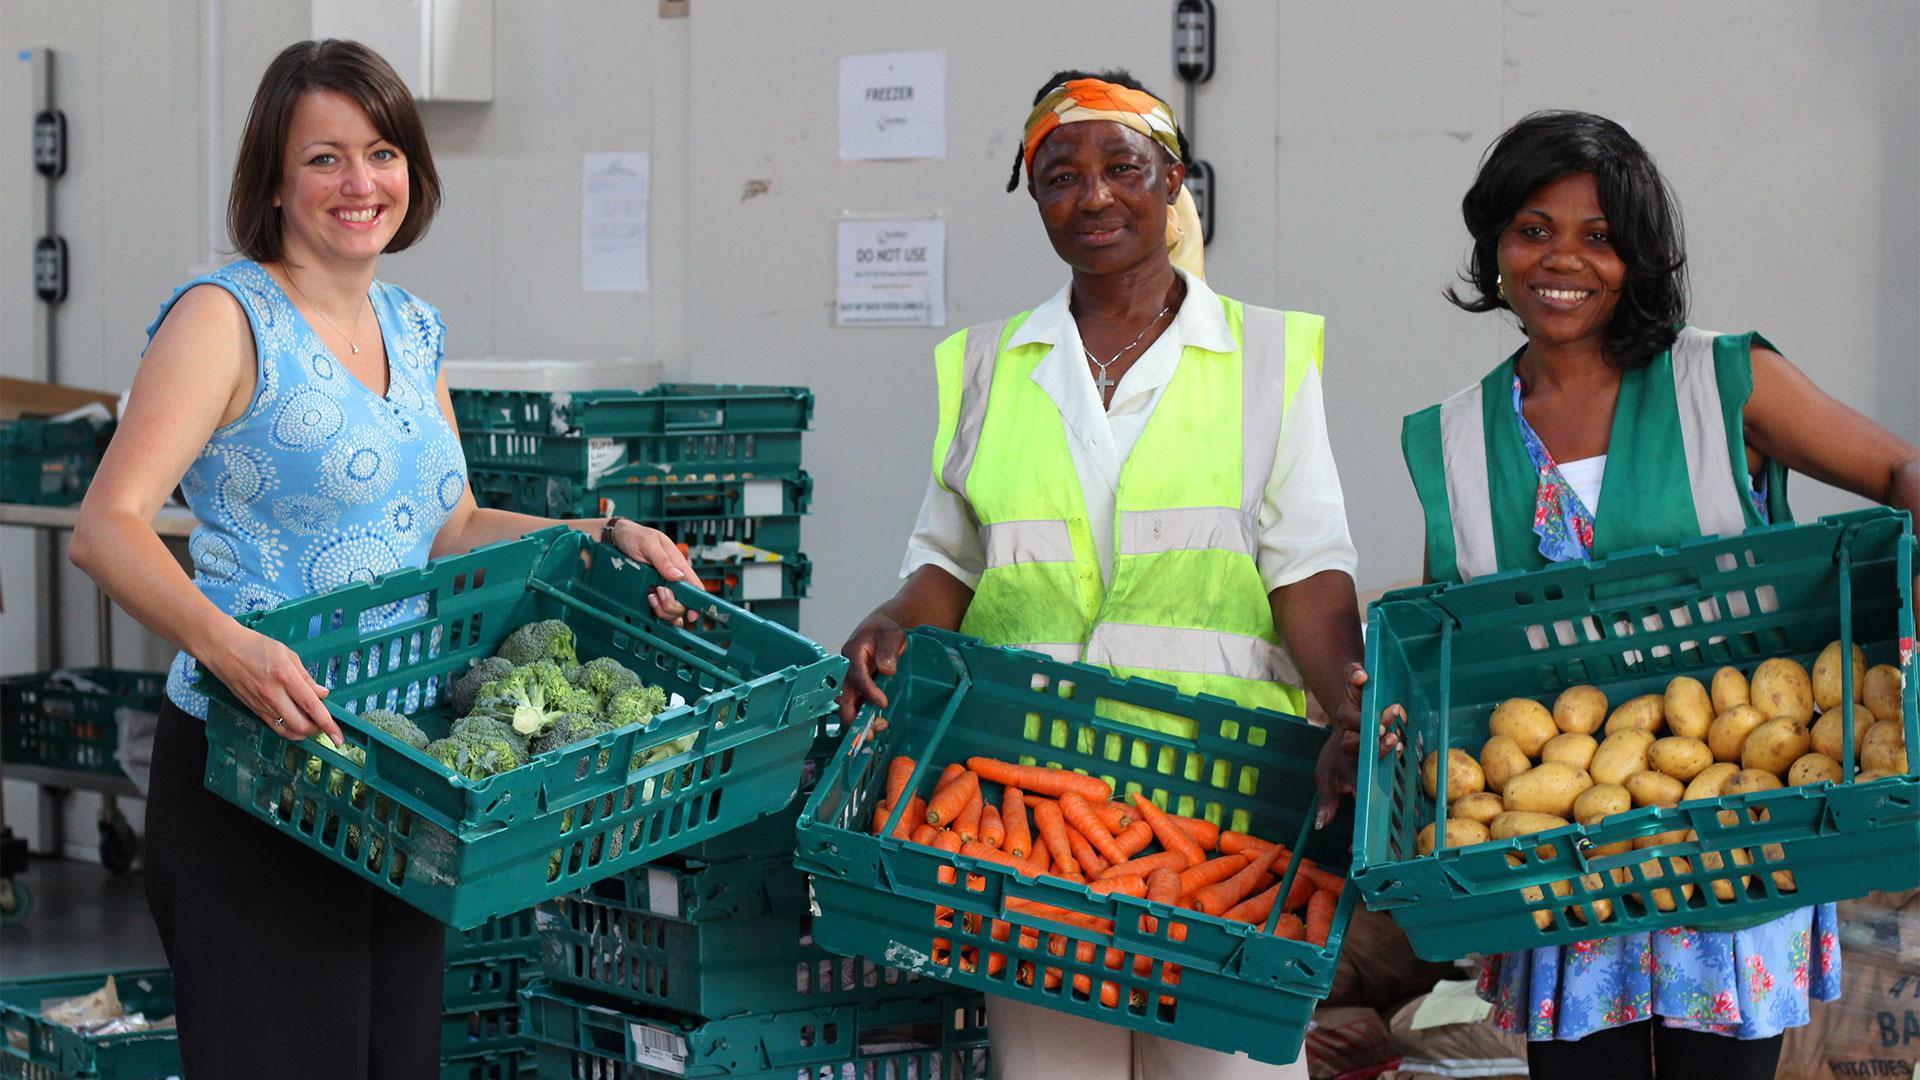 Volunteers at food-waste charity FareShare